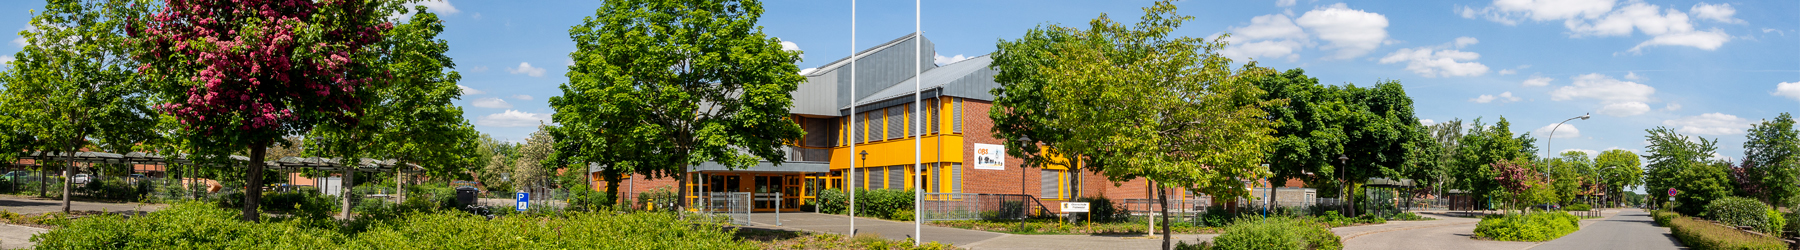 Oberschule Flotwedel